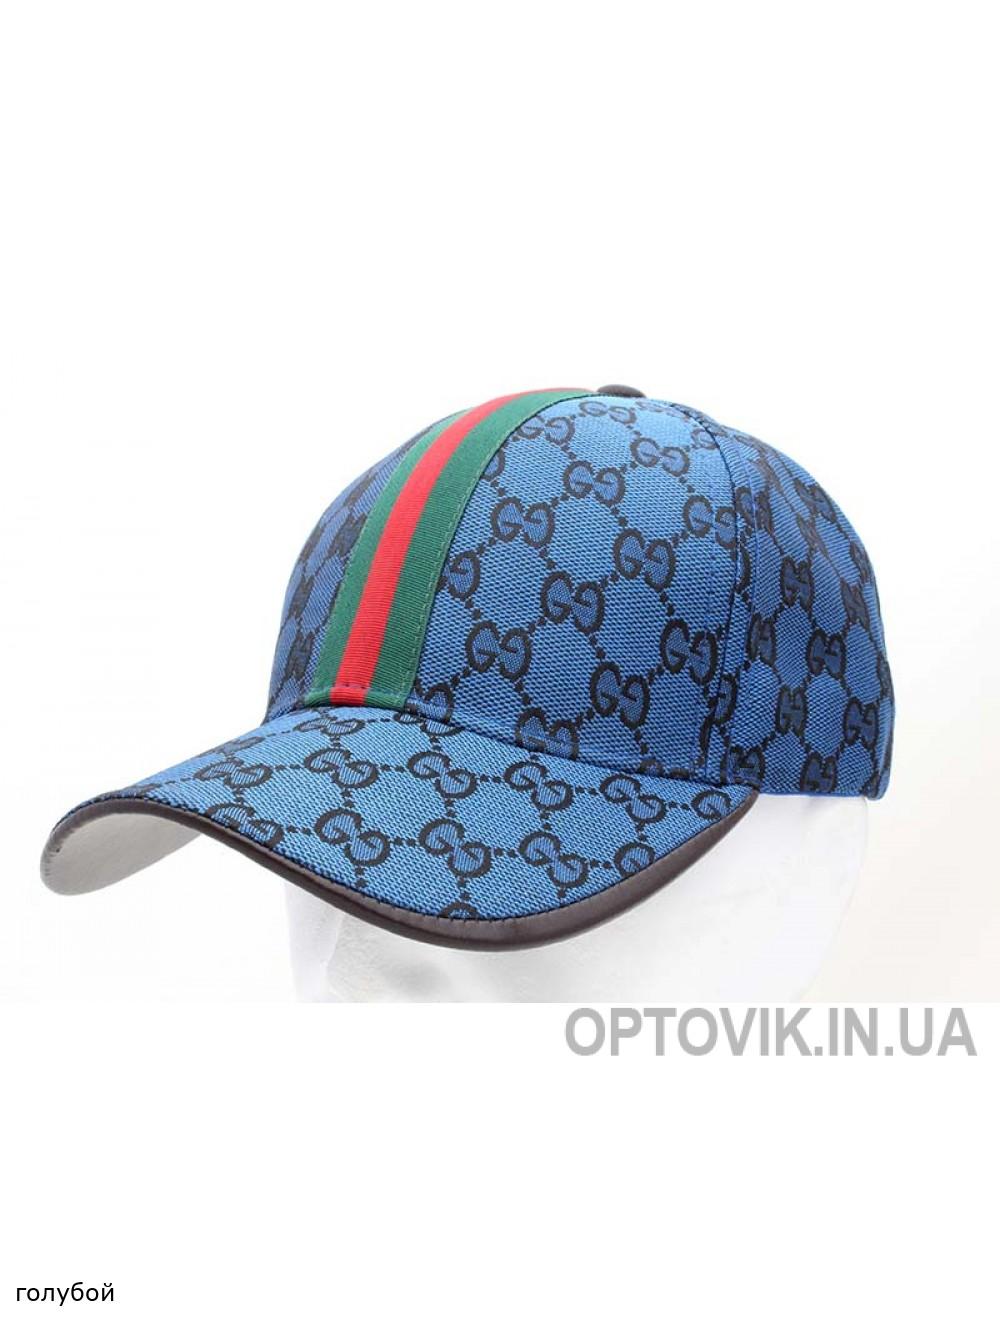 Brand - sp03130